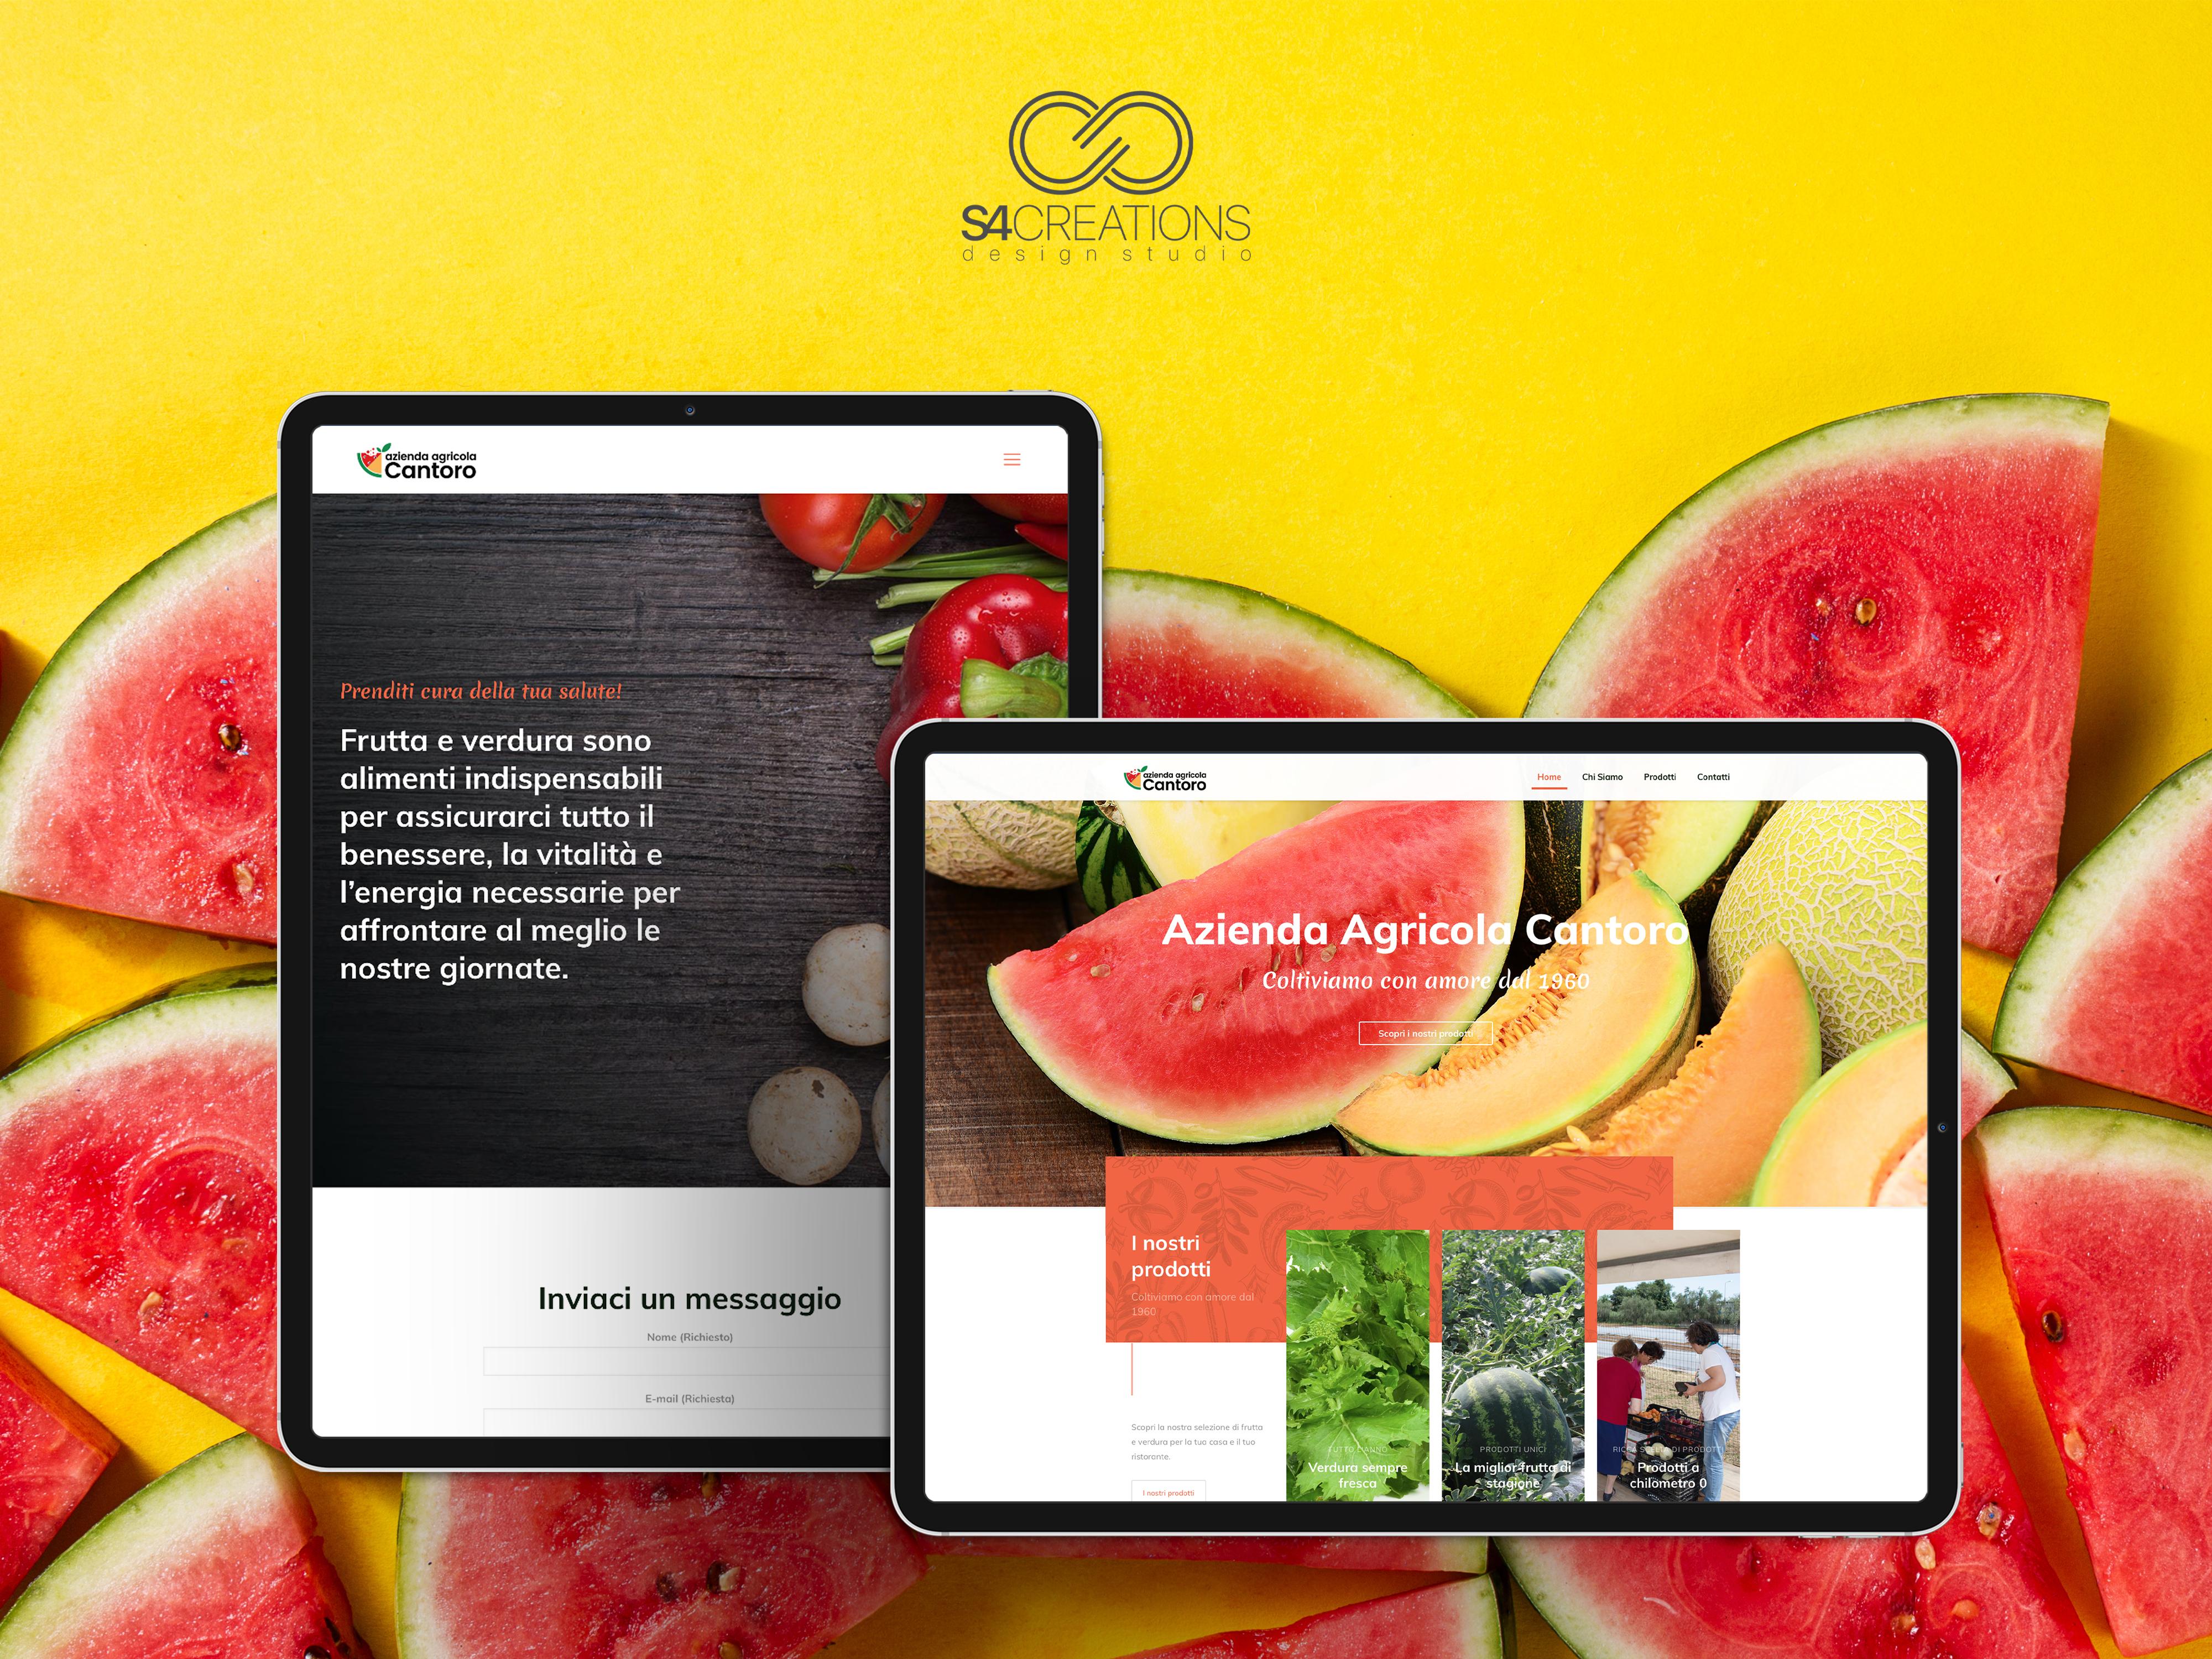 S4Creations-Cantoro-web